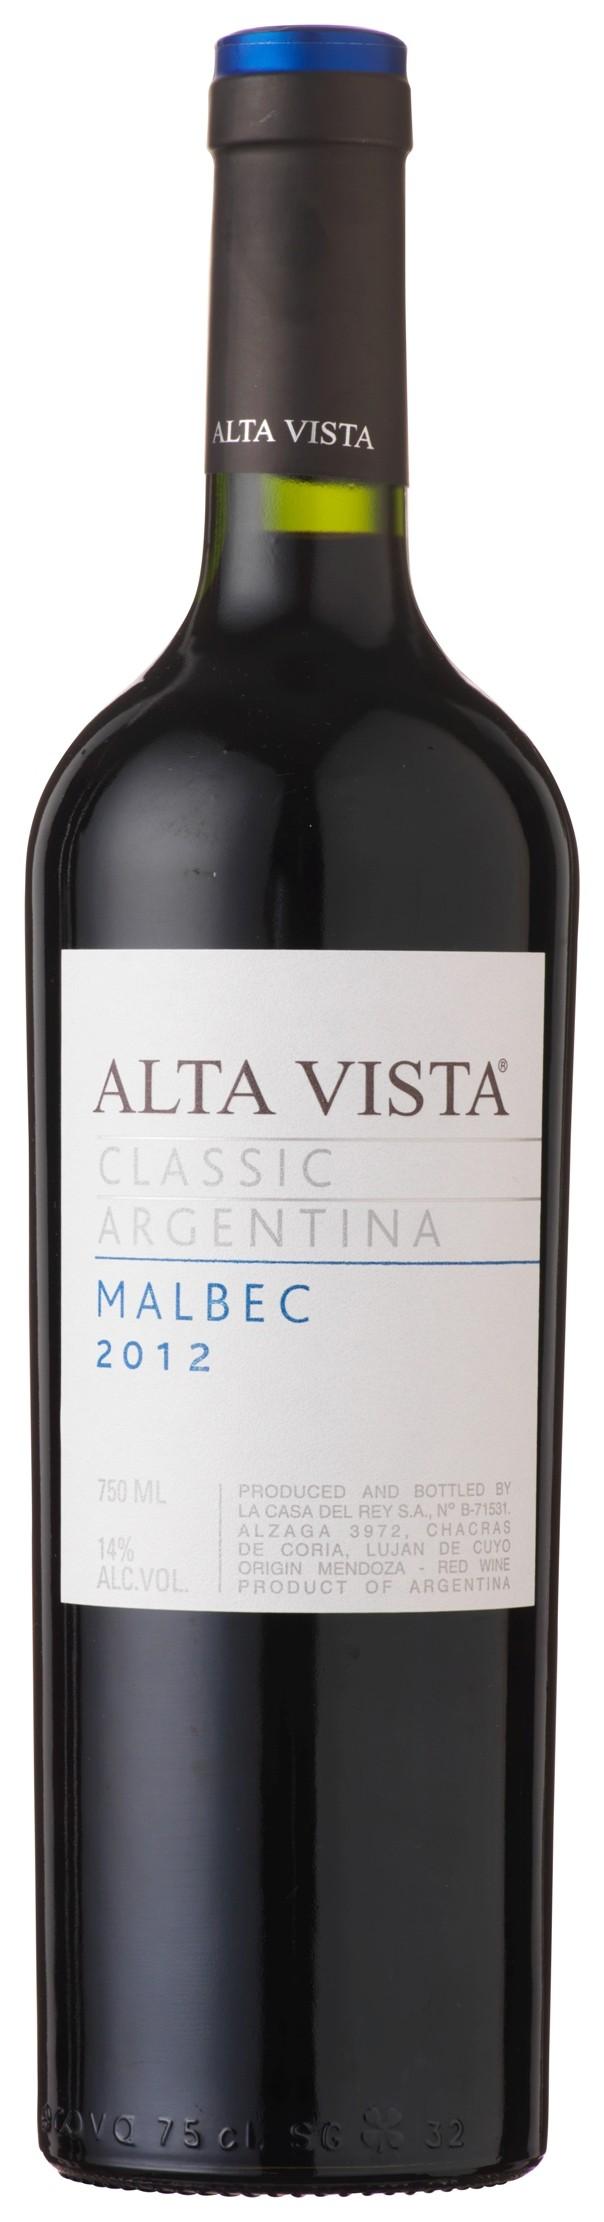 Alta Vista - Malbec Vive, 2019